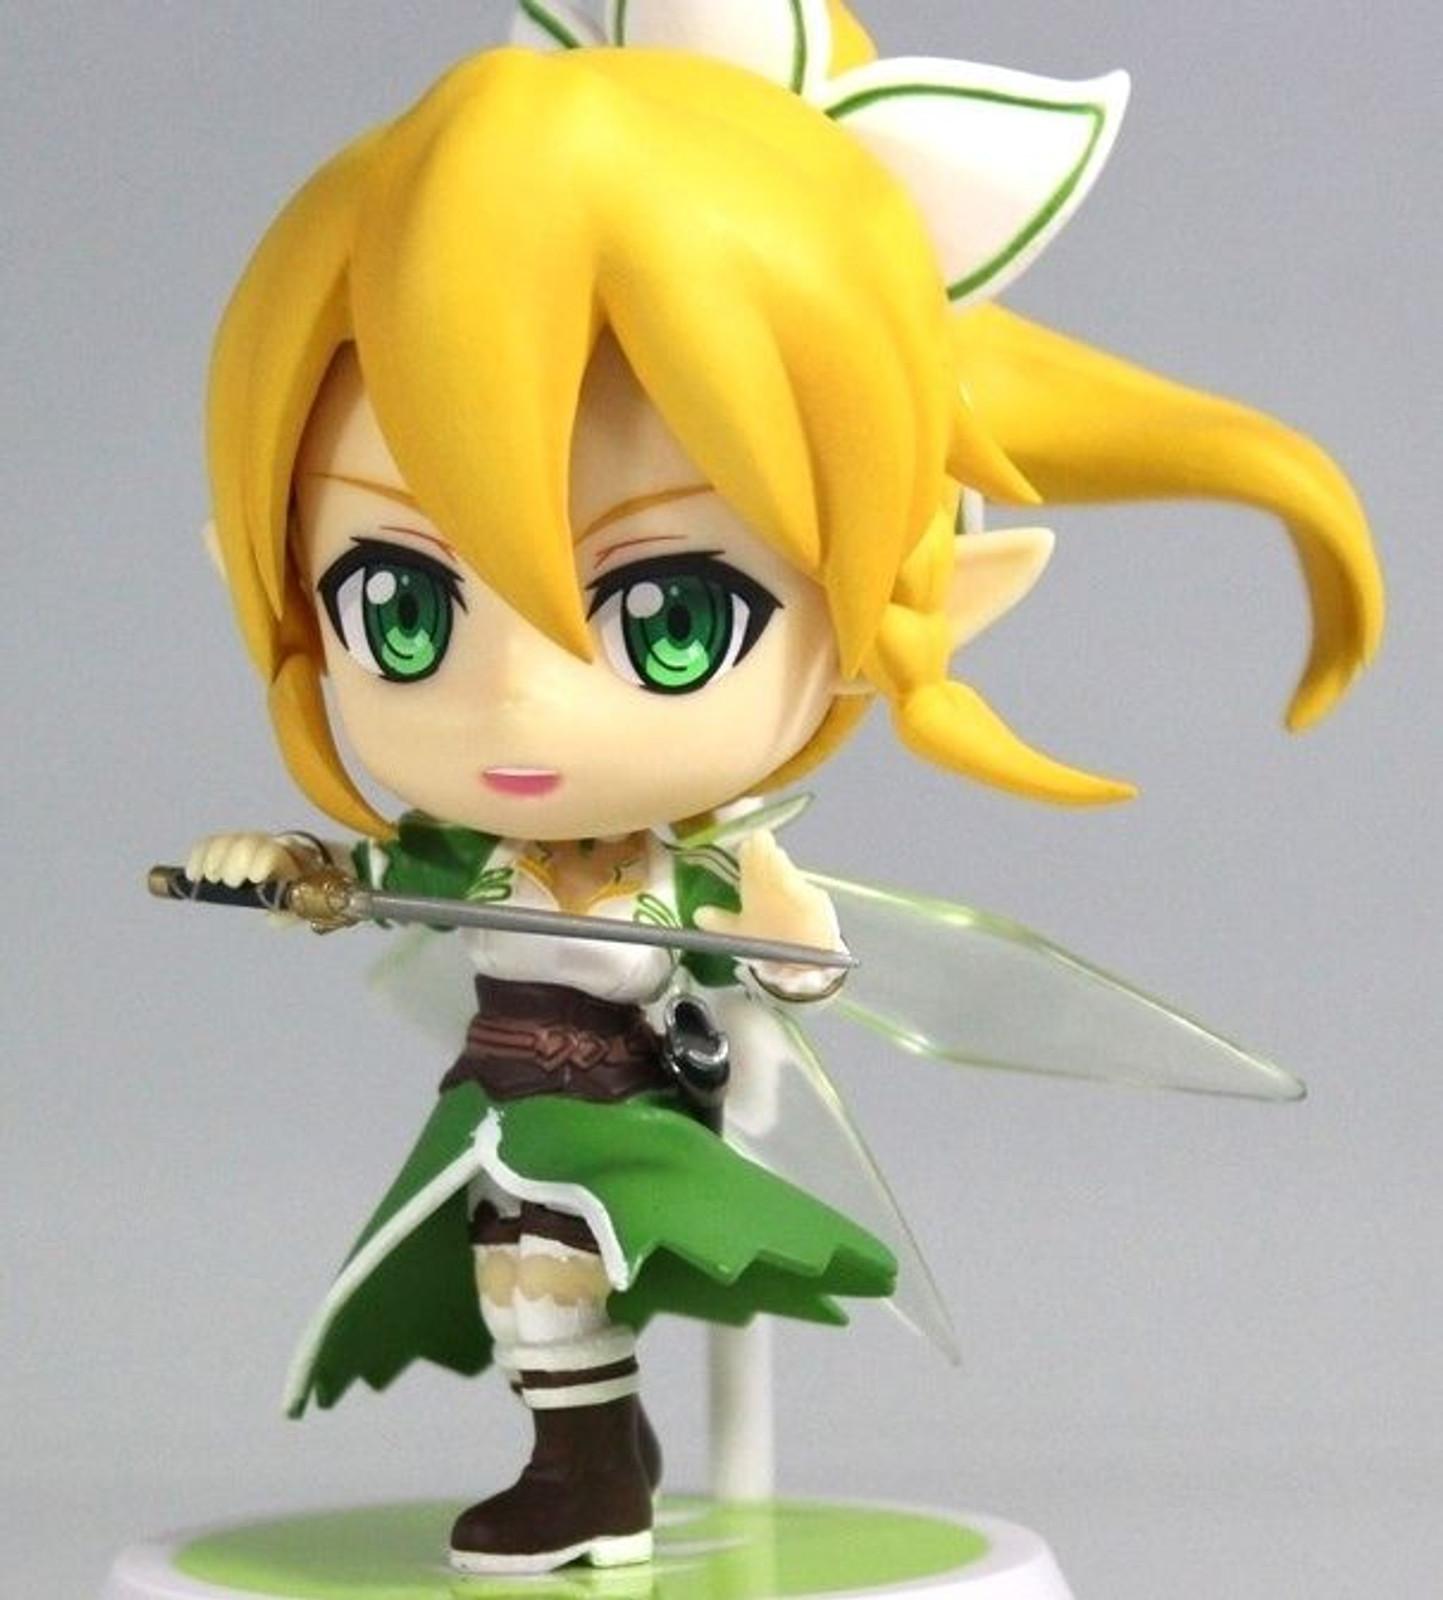 Sword Art Online SAO Leafa Ichiban Kuji Kyun Chara Mini Figure JAPAN ANIME MANGA